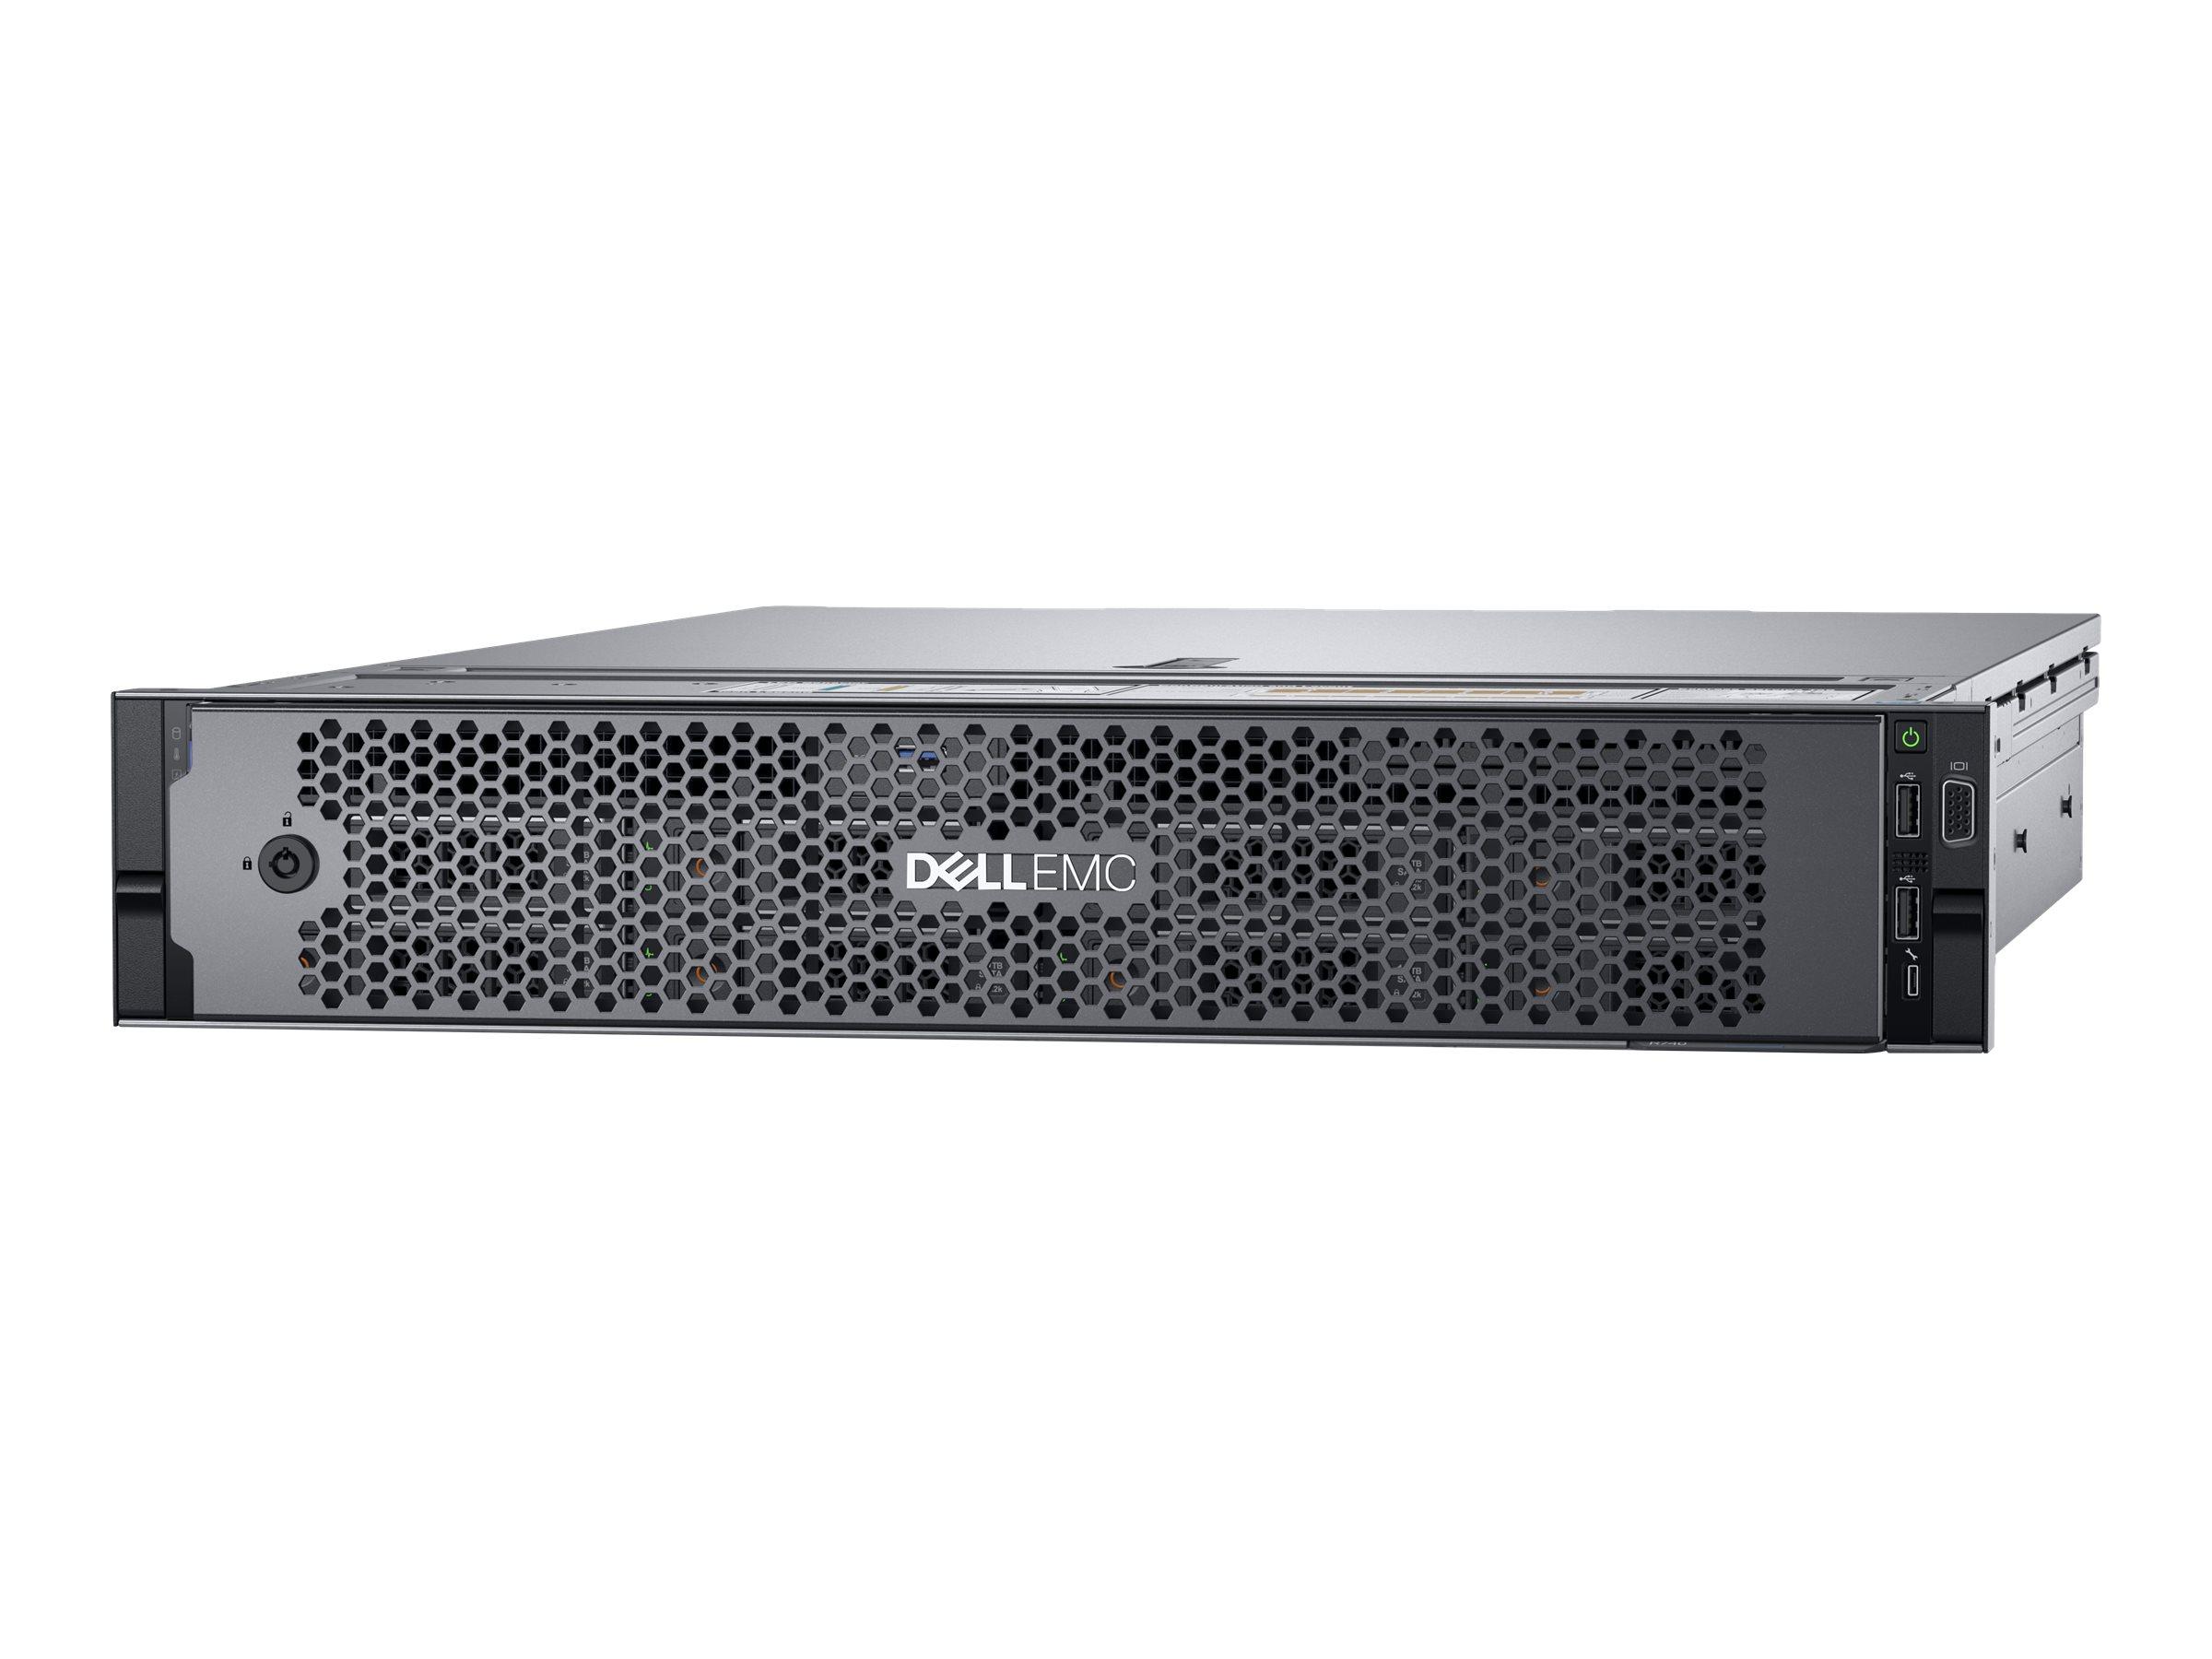 Dell EMC PowerEdge R740 - Server - Rack-Montage - 2U - zweiweg - 1 x Xeon Silver 4110 / 2.1 GHz - RAM 16 GB - SAS - Hot-